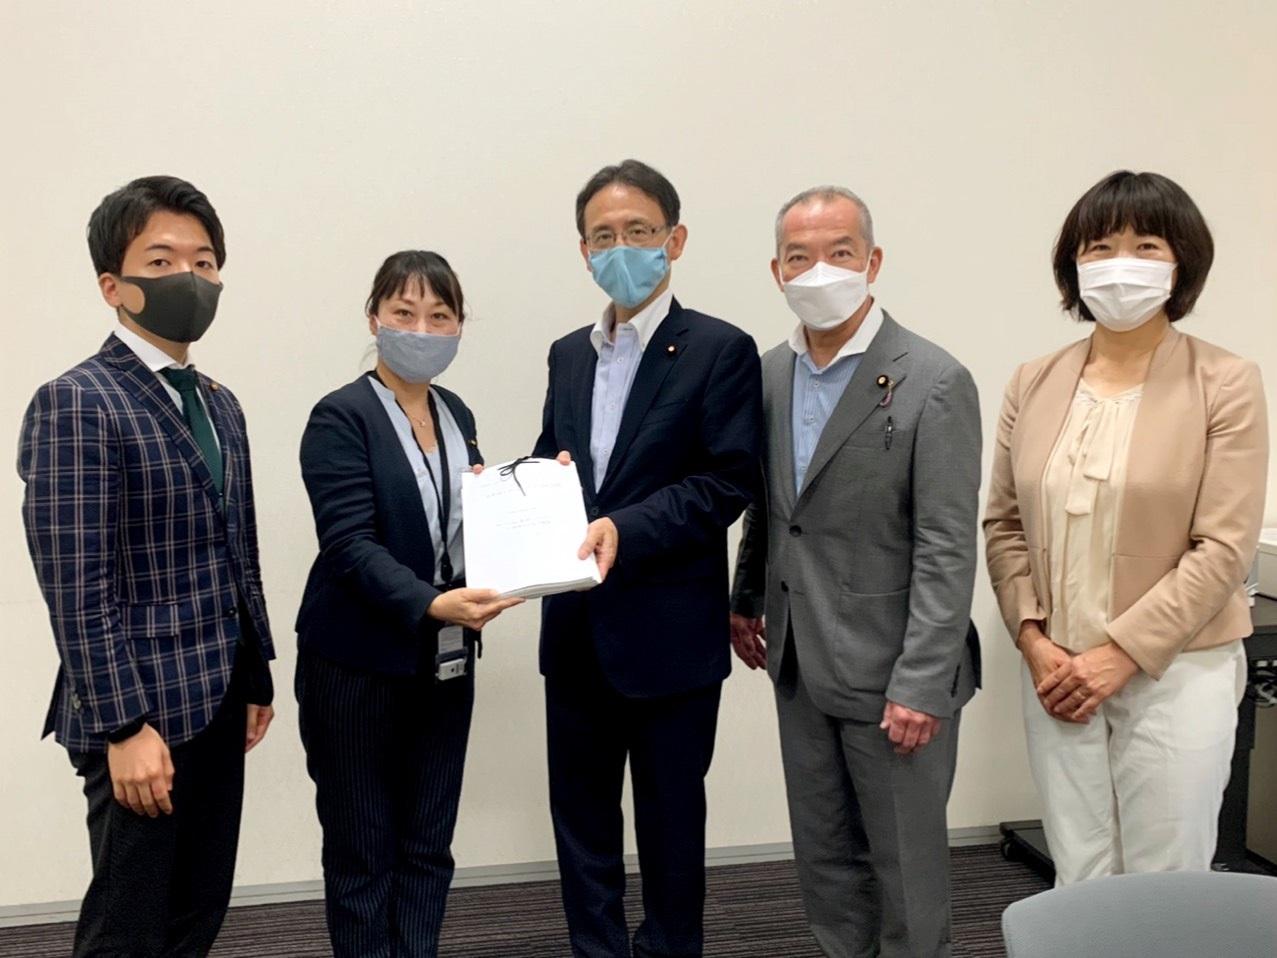 国会請願署名を手渡す(写真左から、武下・宮下・塩川・伊藤・梅村各氏)